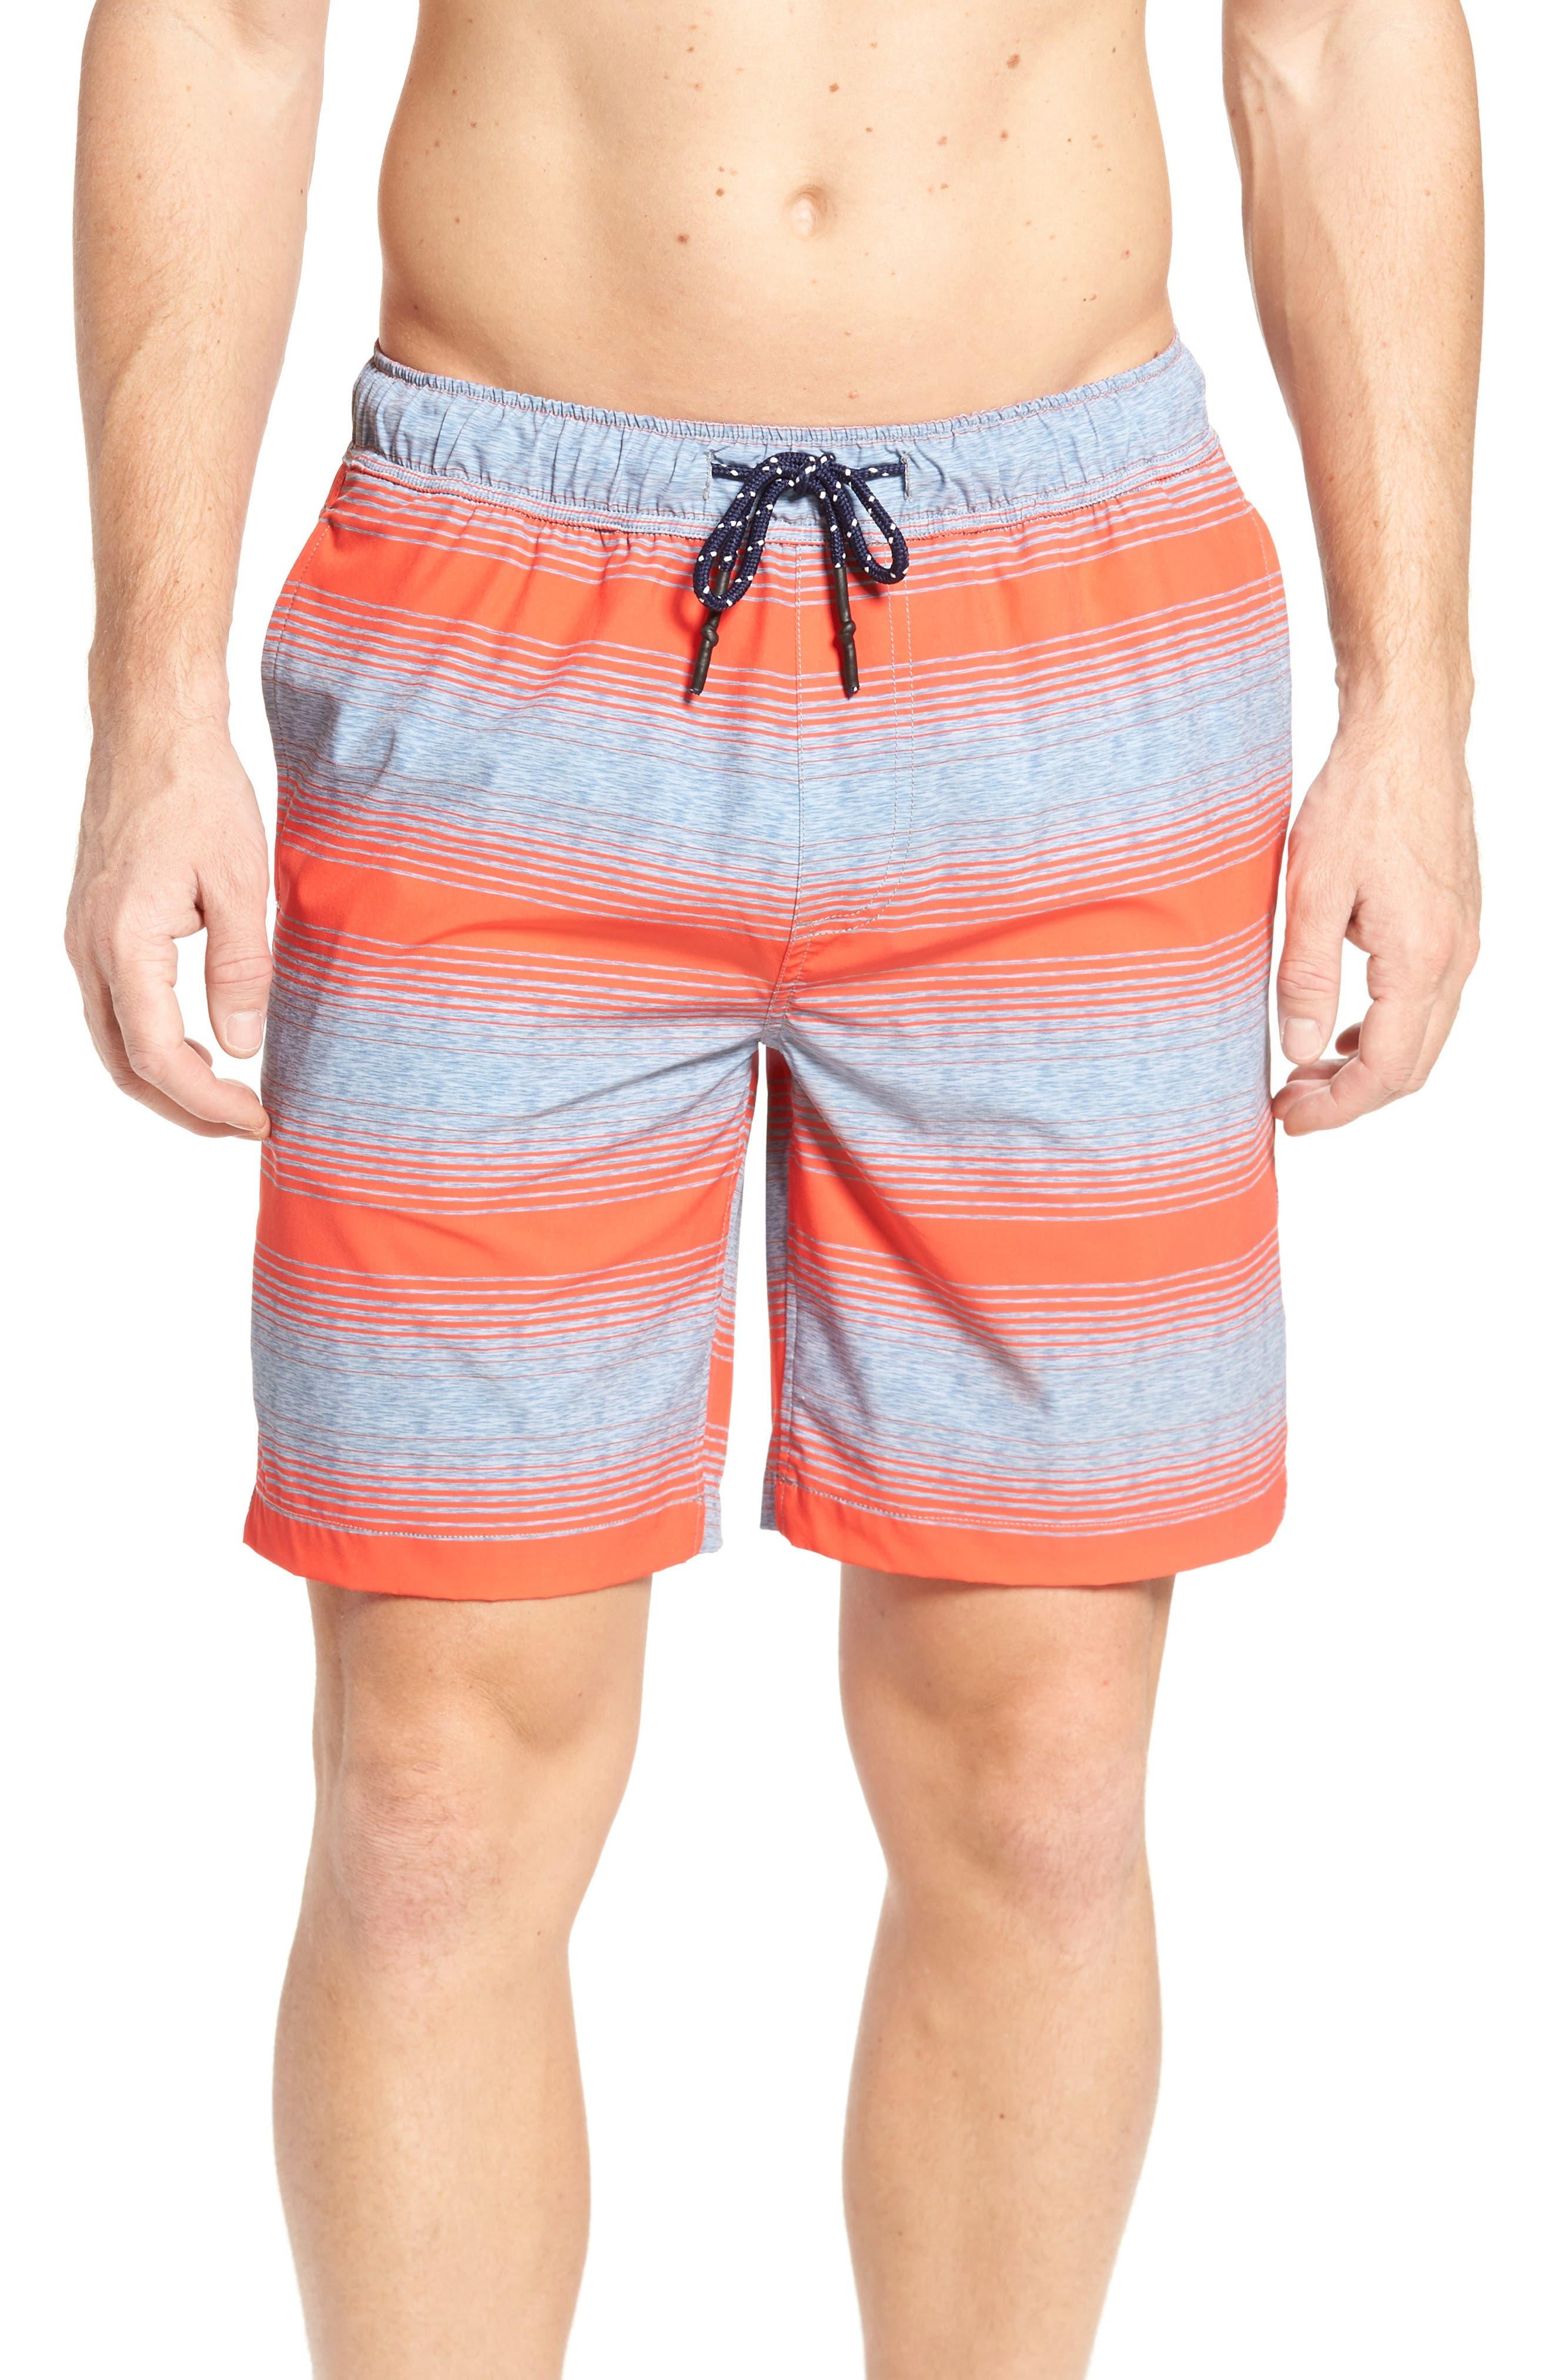 Stripe Swim Trunks,                             Main thumbnail 1, color,                             Hot Coral